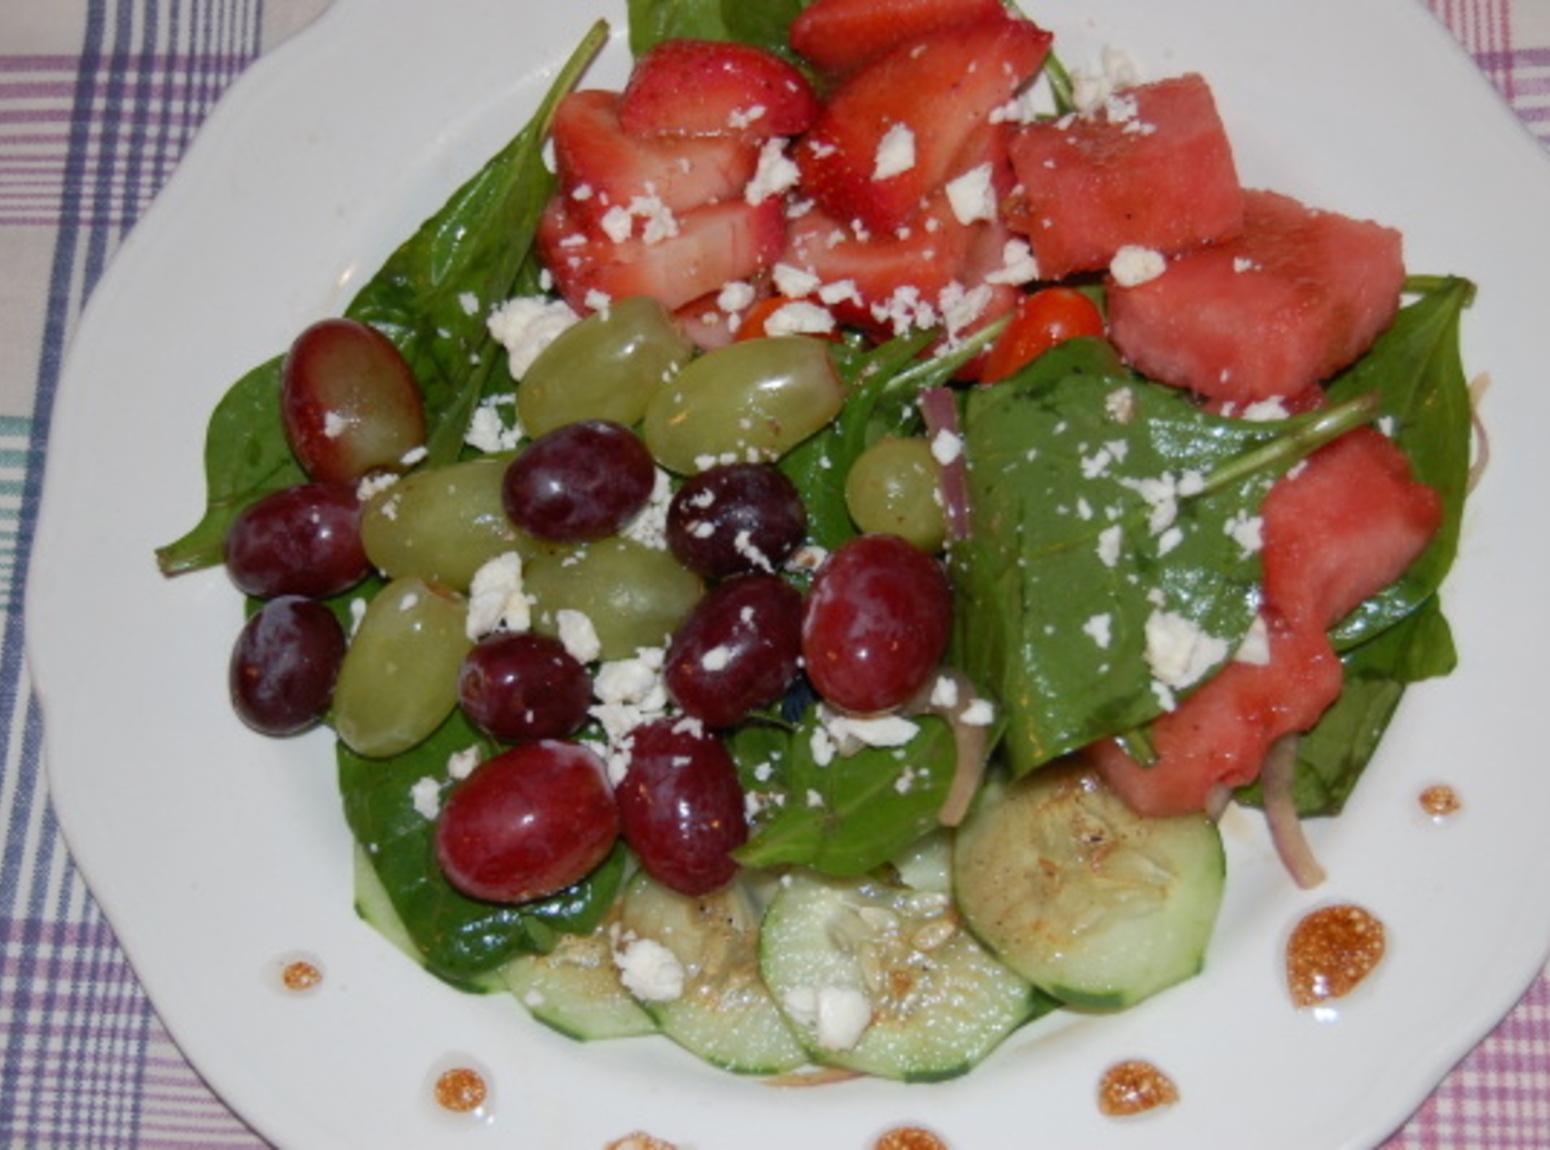 WATERMELON & BABY SPINACH W/BALSAMIC VINAIGRETTE Recipe